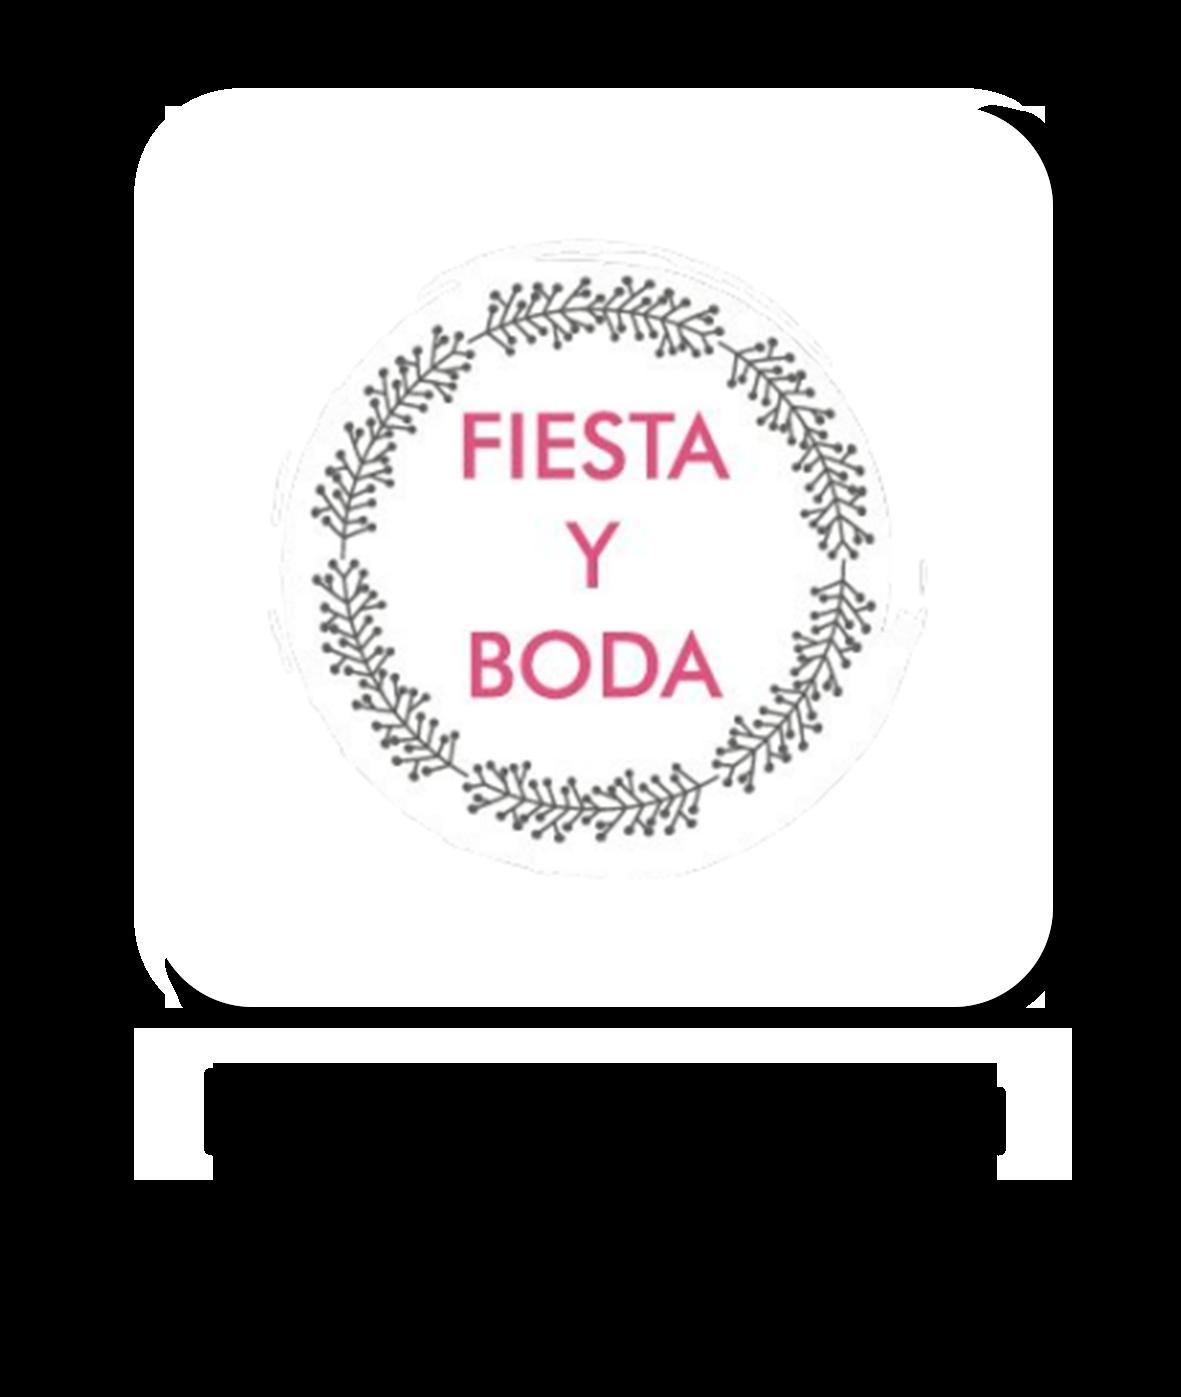 Play&go experience_FiestayBoda